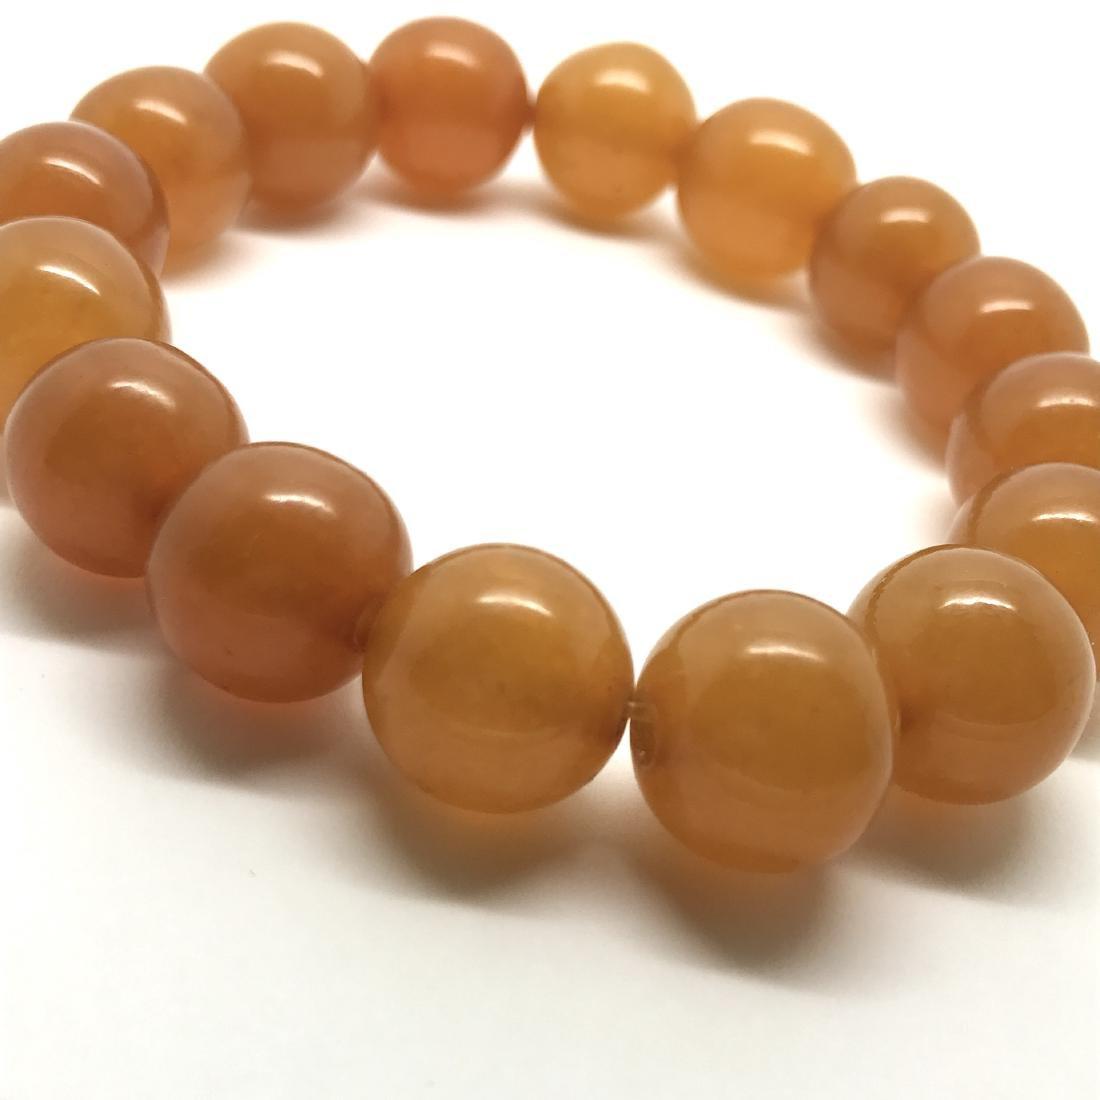 Antique Baltic amber beads bracelet 21.5 gr - 5